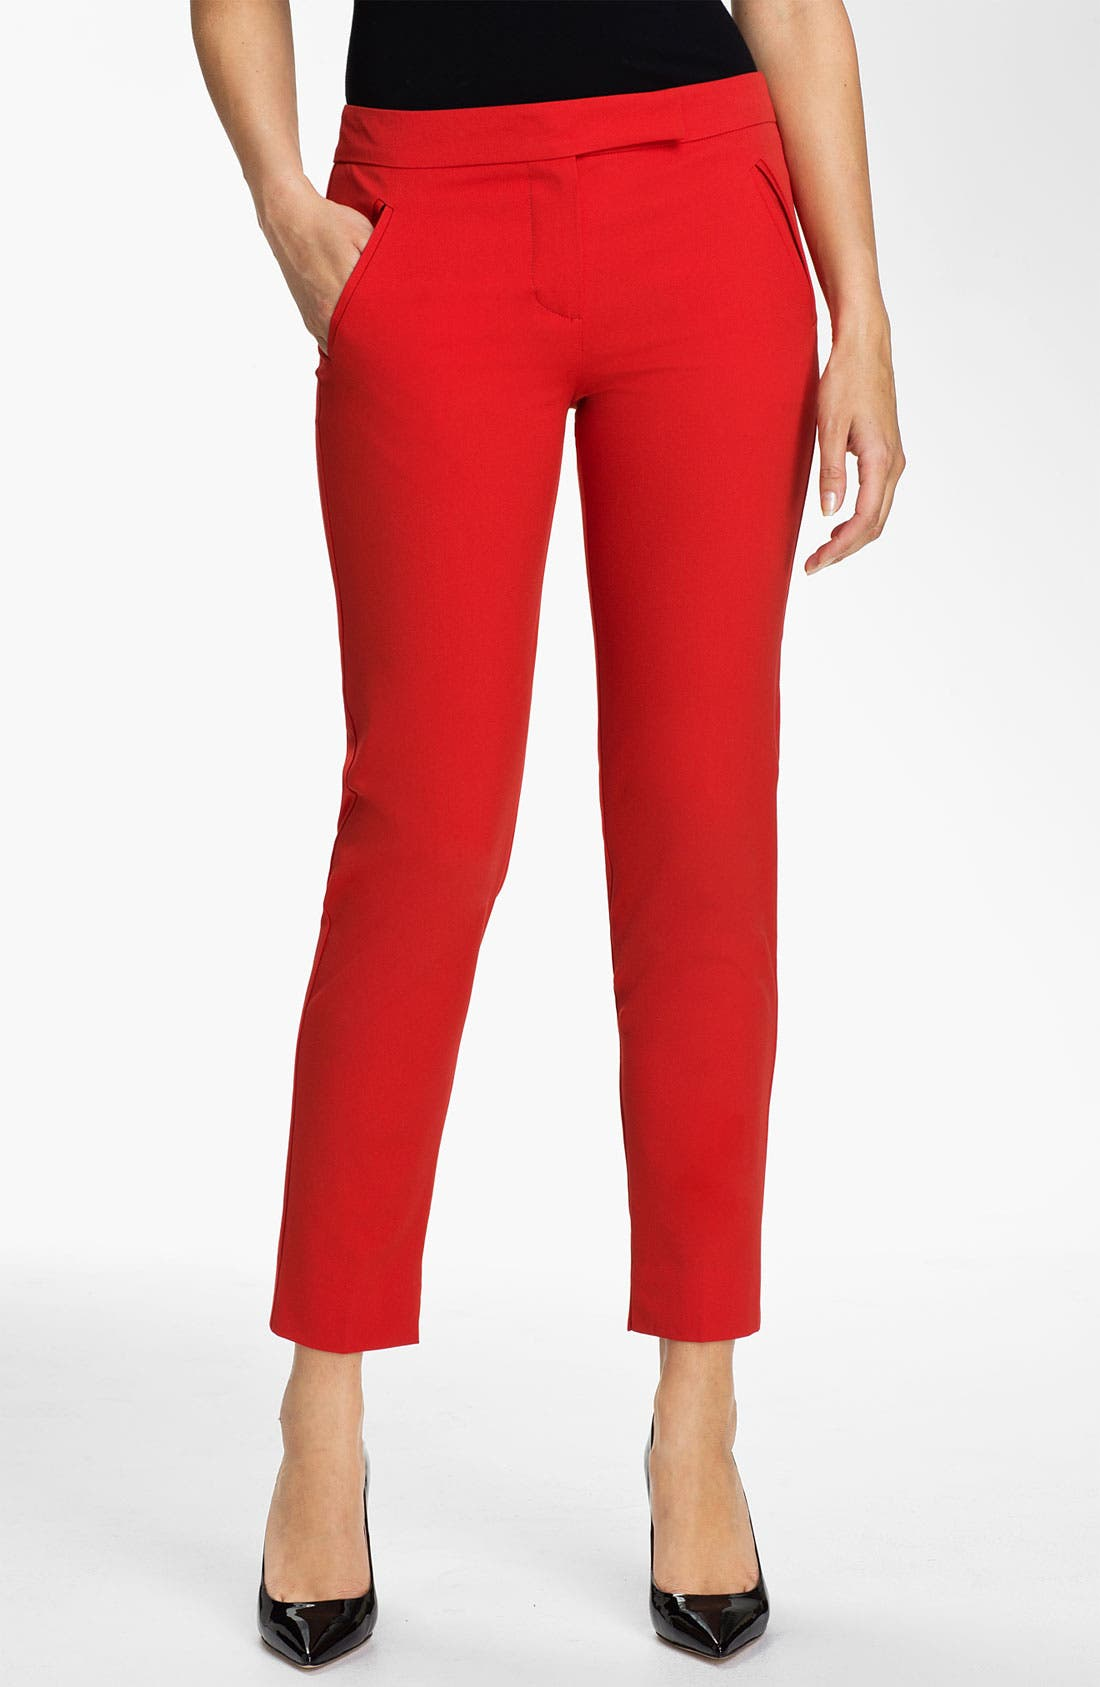 Alternate Image 1 Selected - Trina Turk 'Solitaire' Skinny Pants